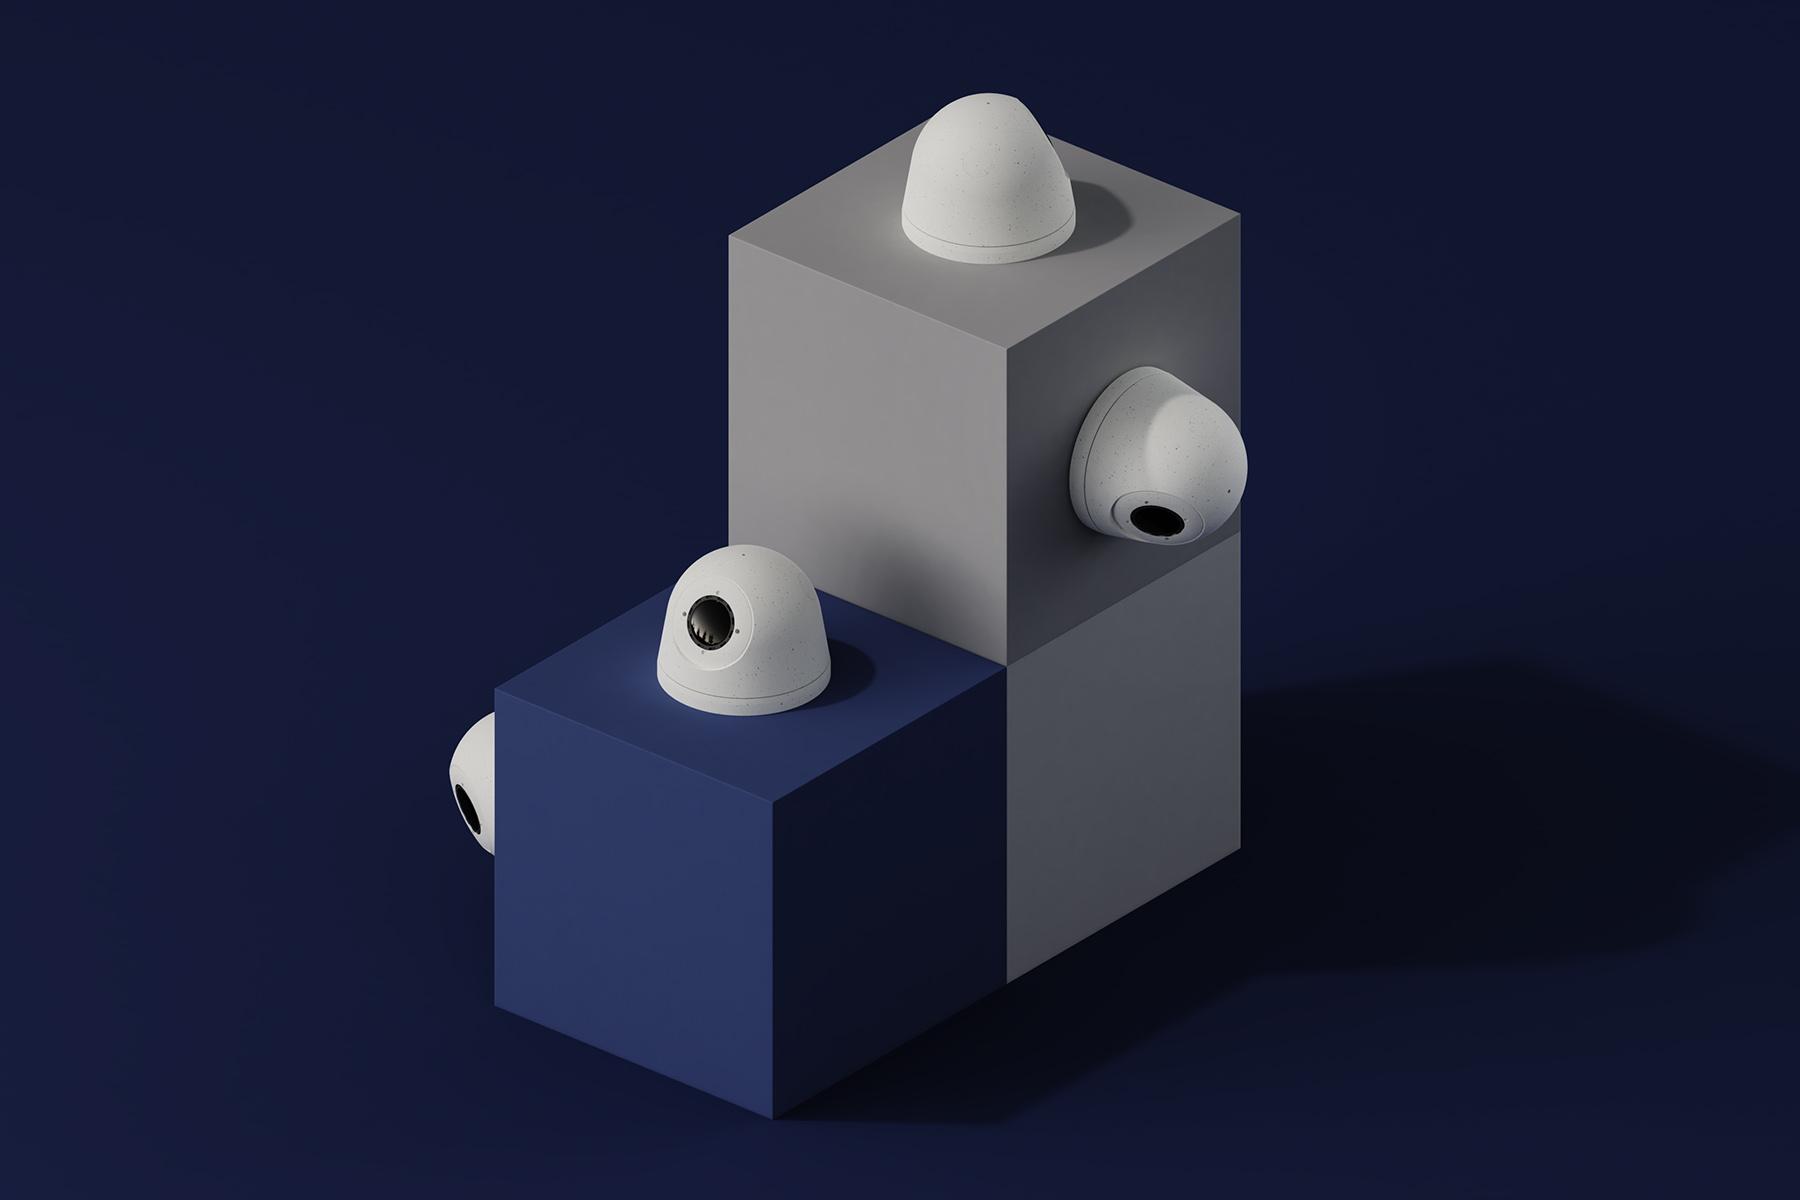 S74_lego bricks